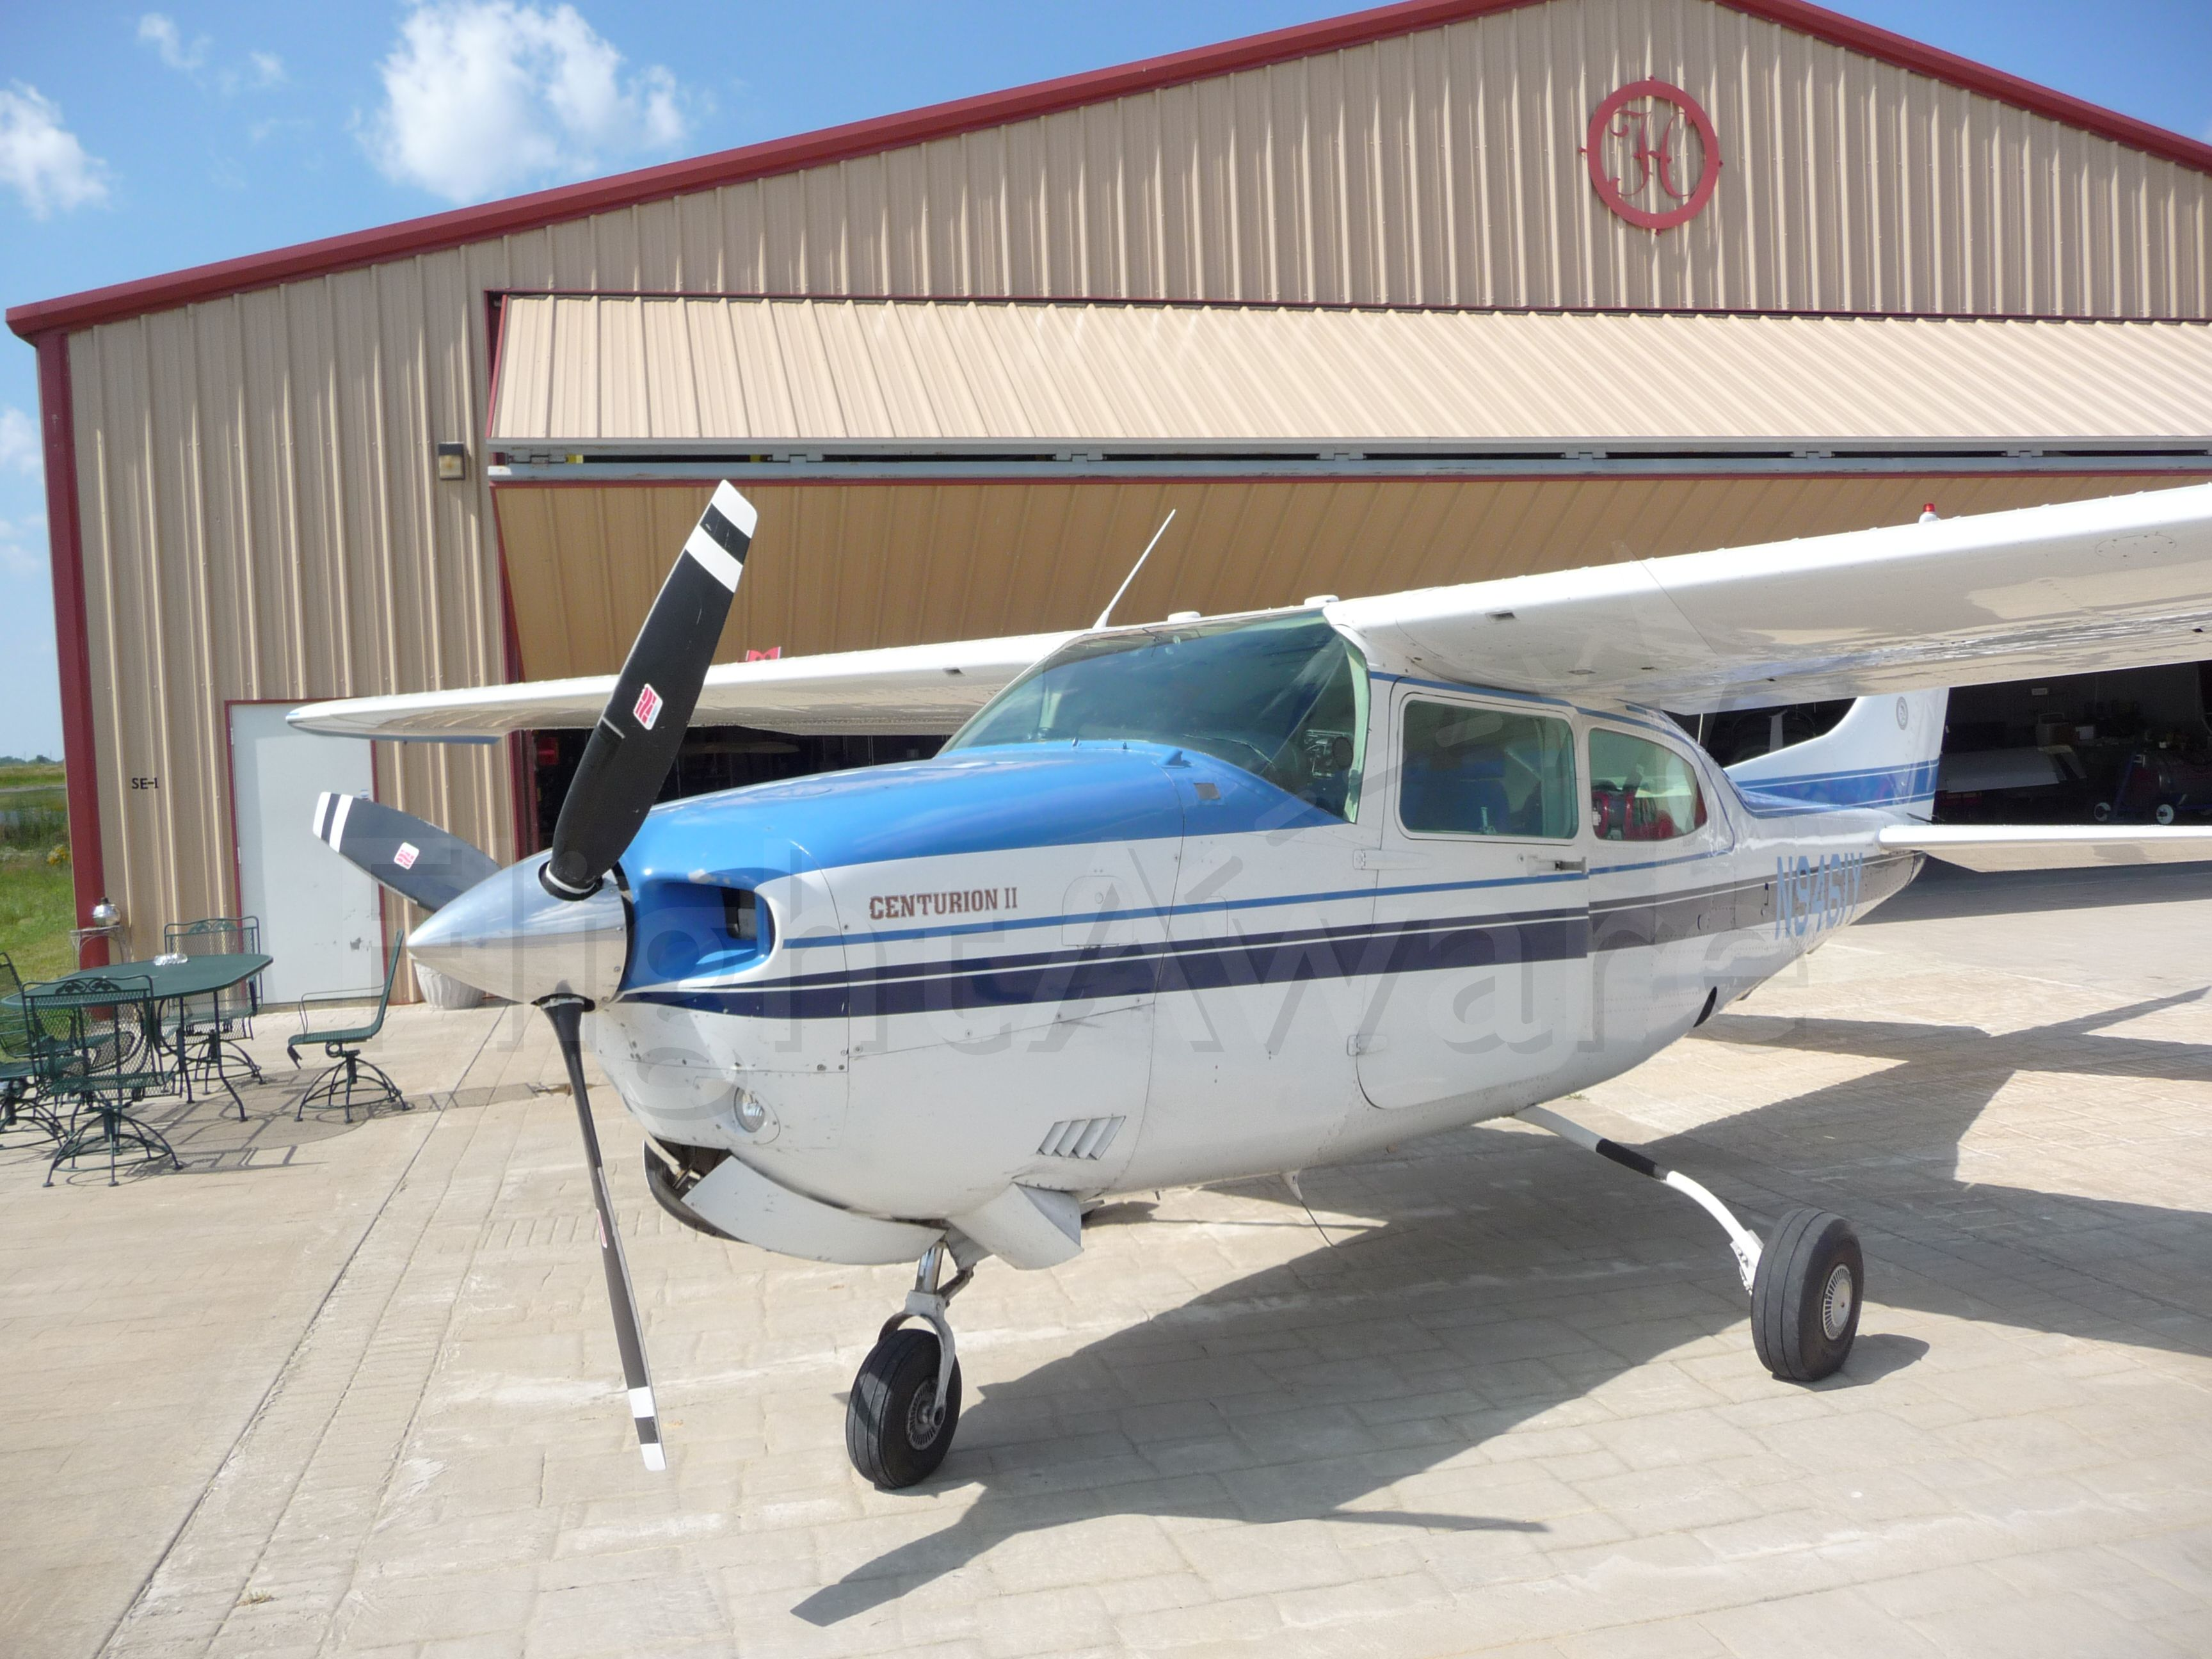 Cessna T210 Turbo Centurion (N9461Y) - 1981 Cessna T210